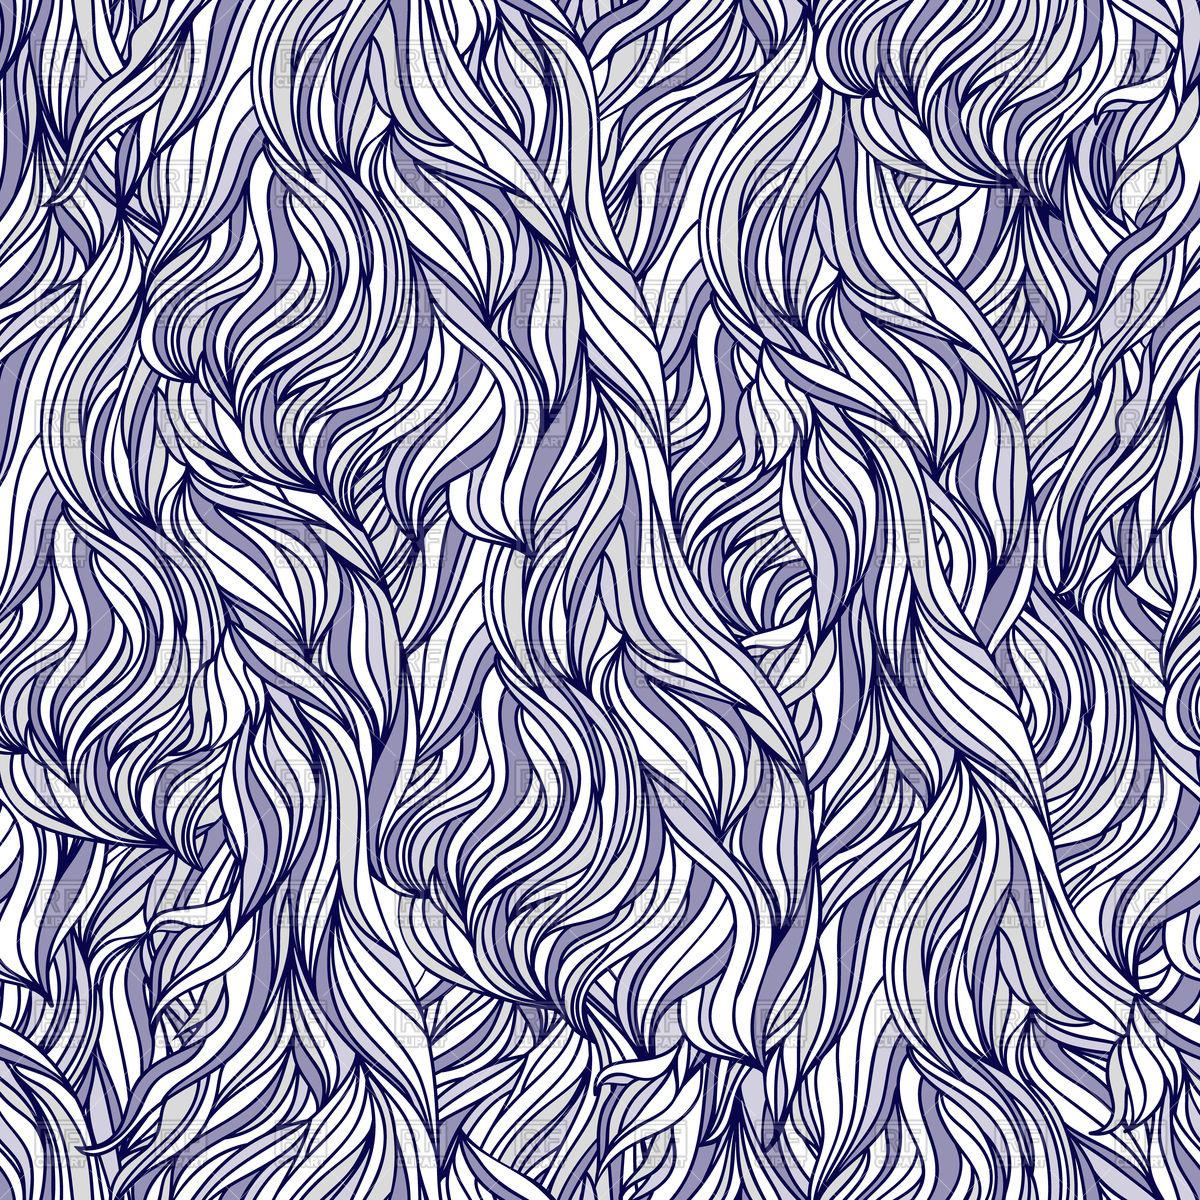 Interweaving abstract seamless pattern, mess.